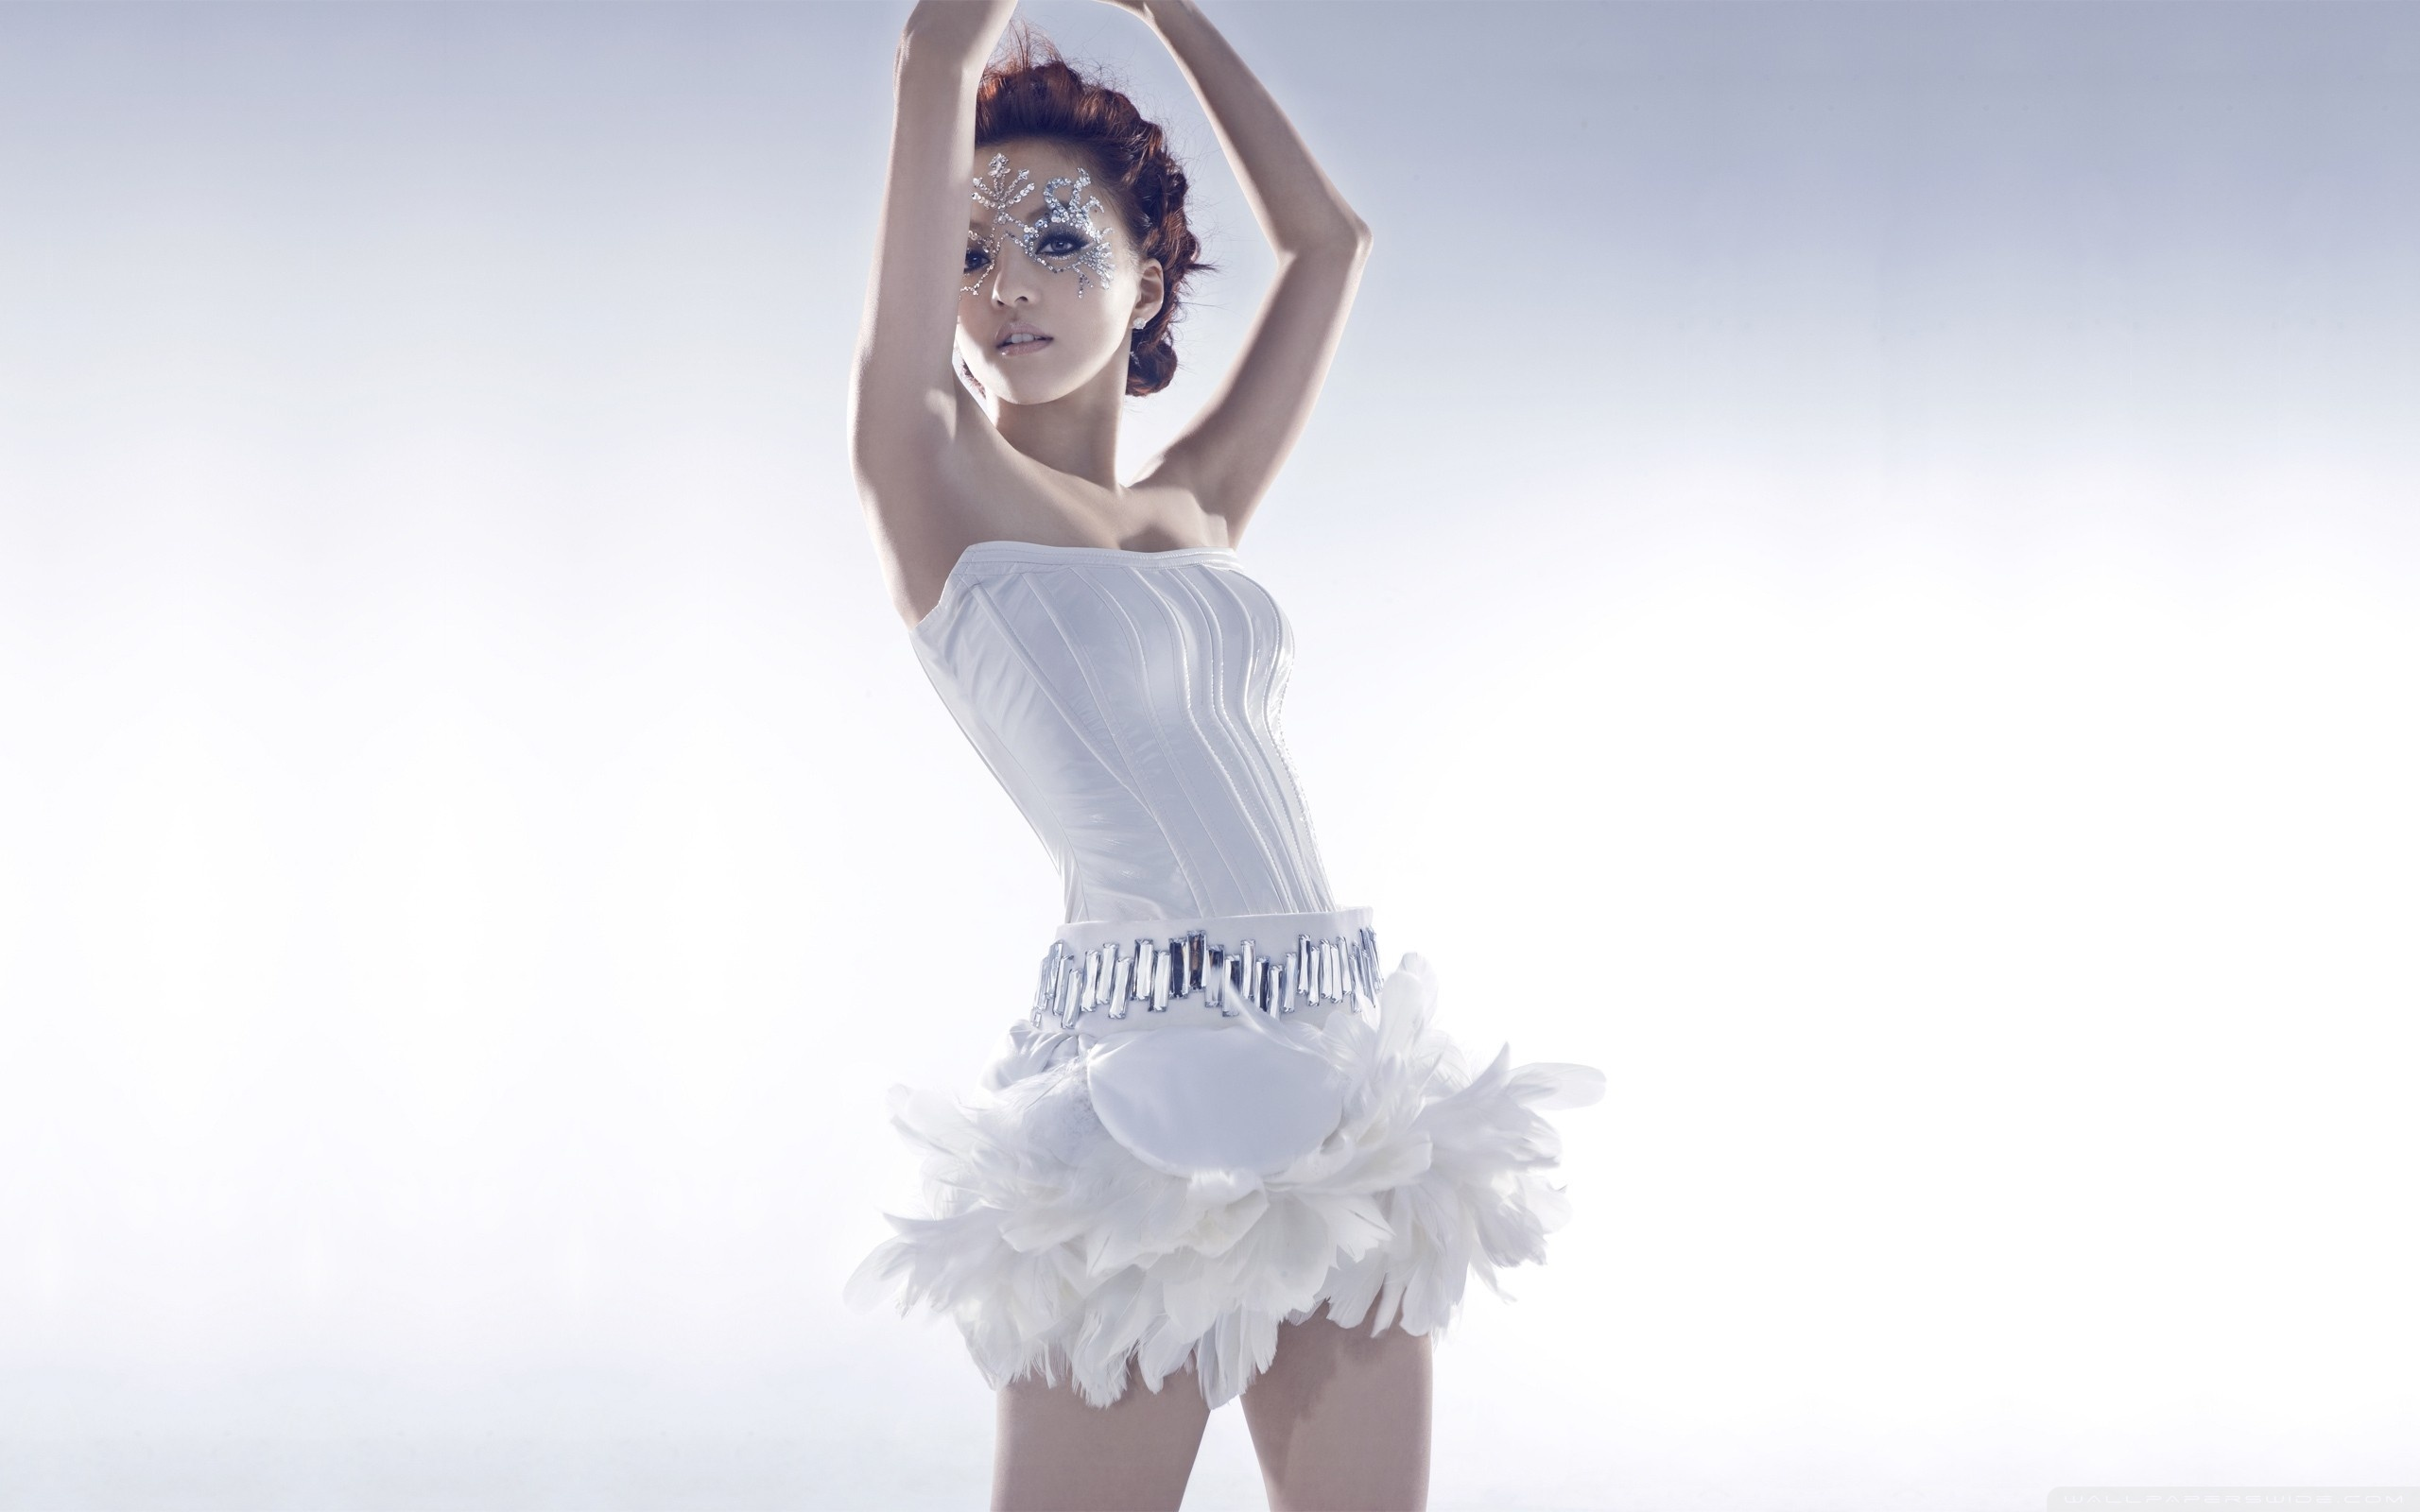 Girl In White Dress ❤ 4K HD Desktop Wallpaper for 4K Ultra HD TV ...